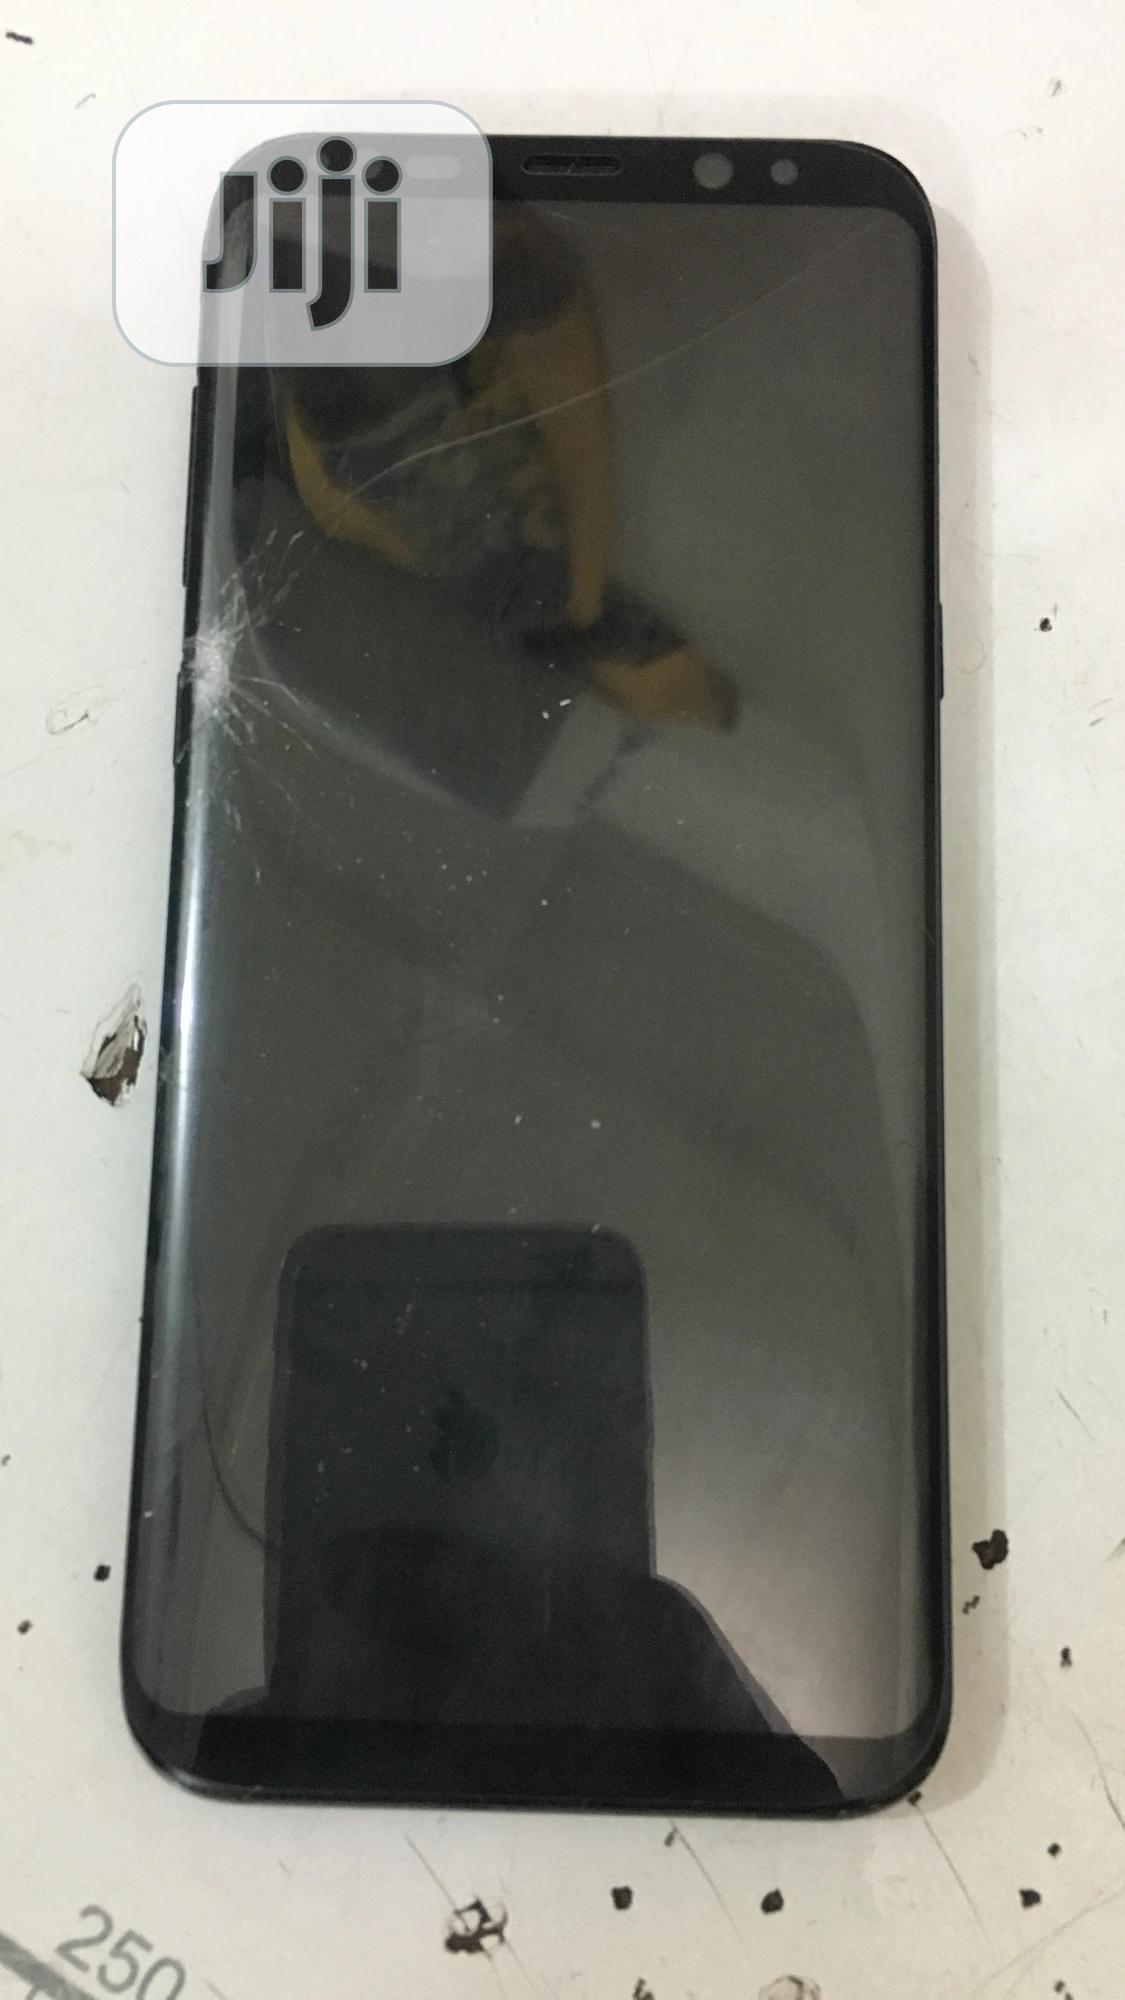 Samsung Galaxy S8 Plus 128 GB Black | Mobile Phones for sale in Victoria Island, Lagos State, Nigeria